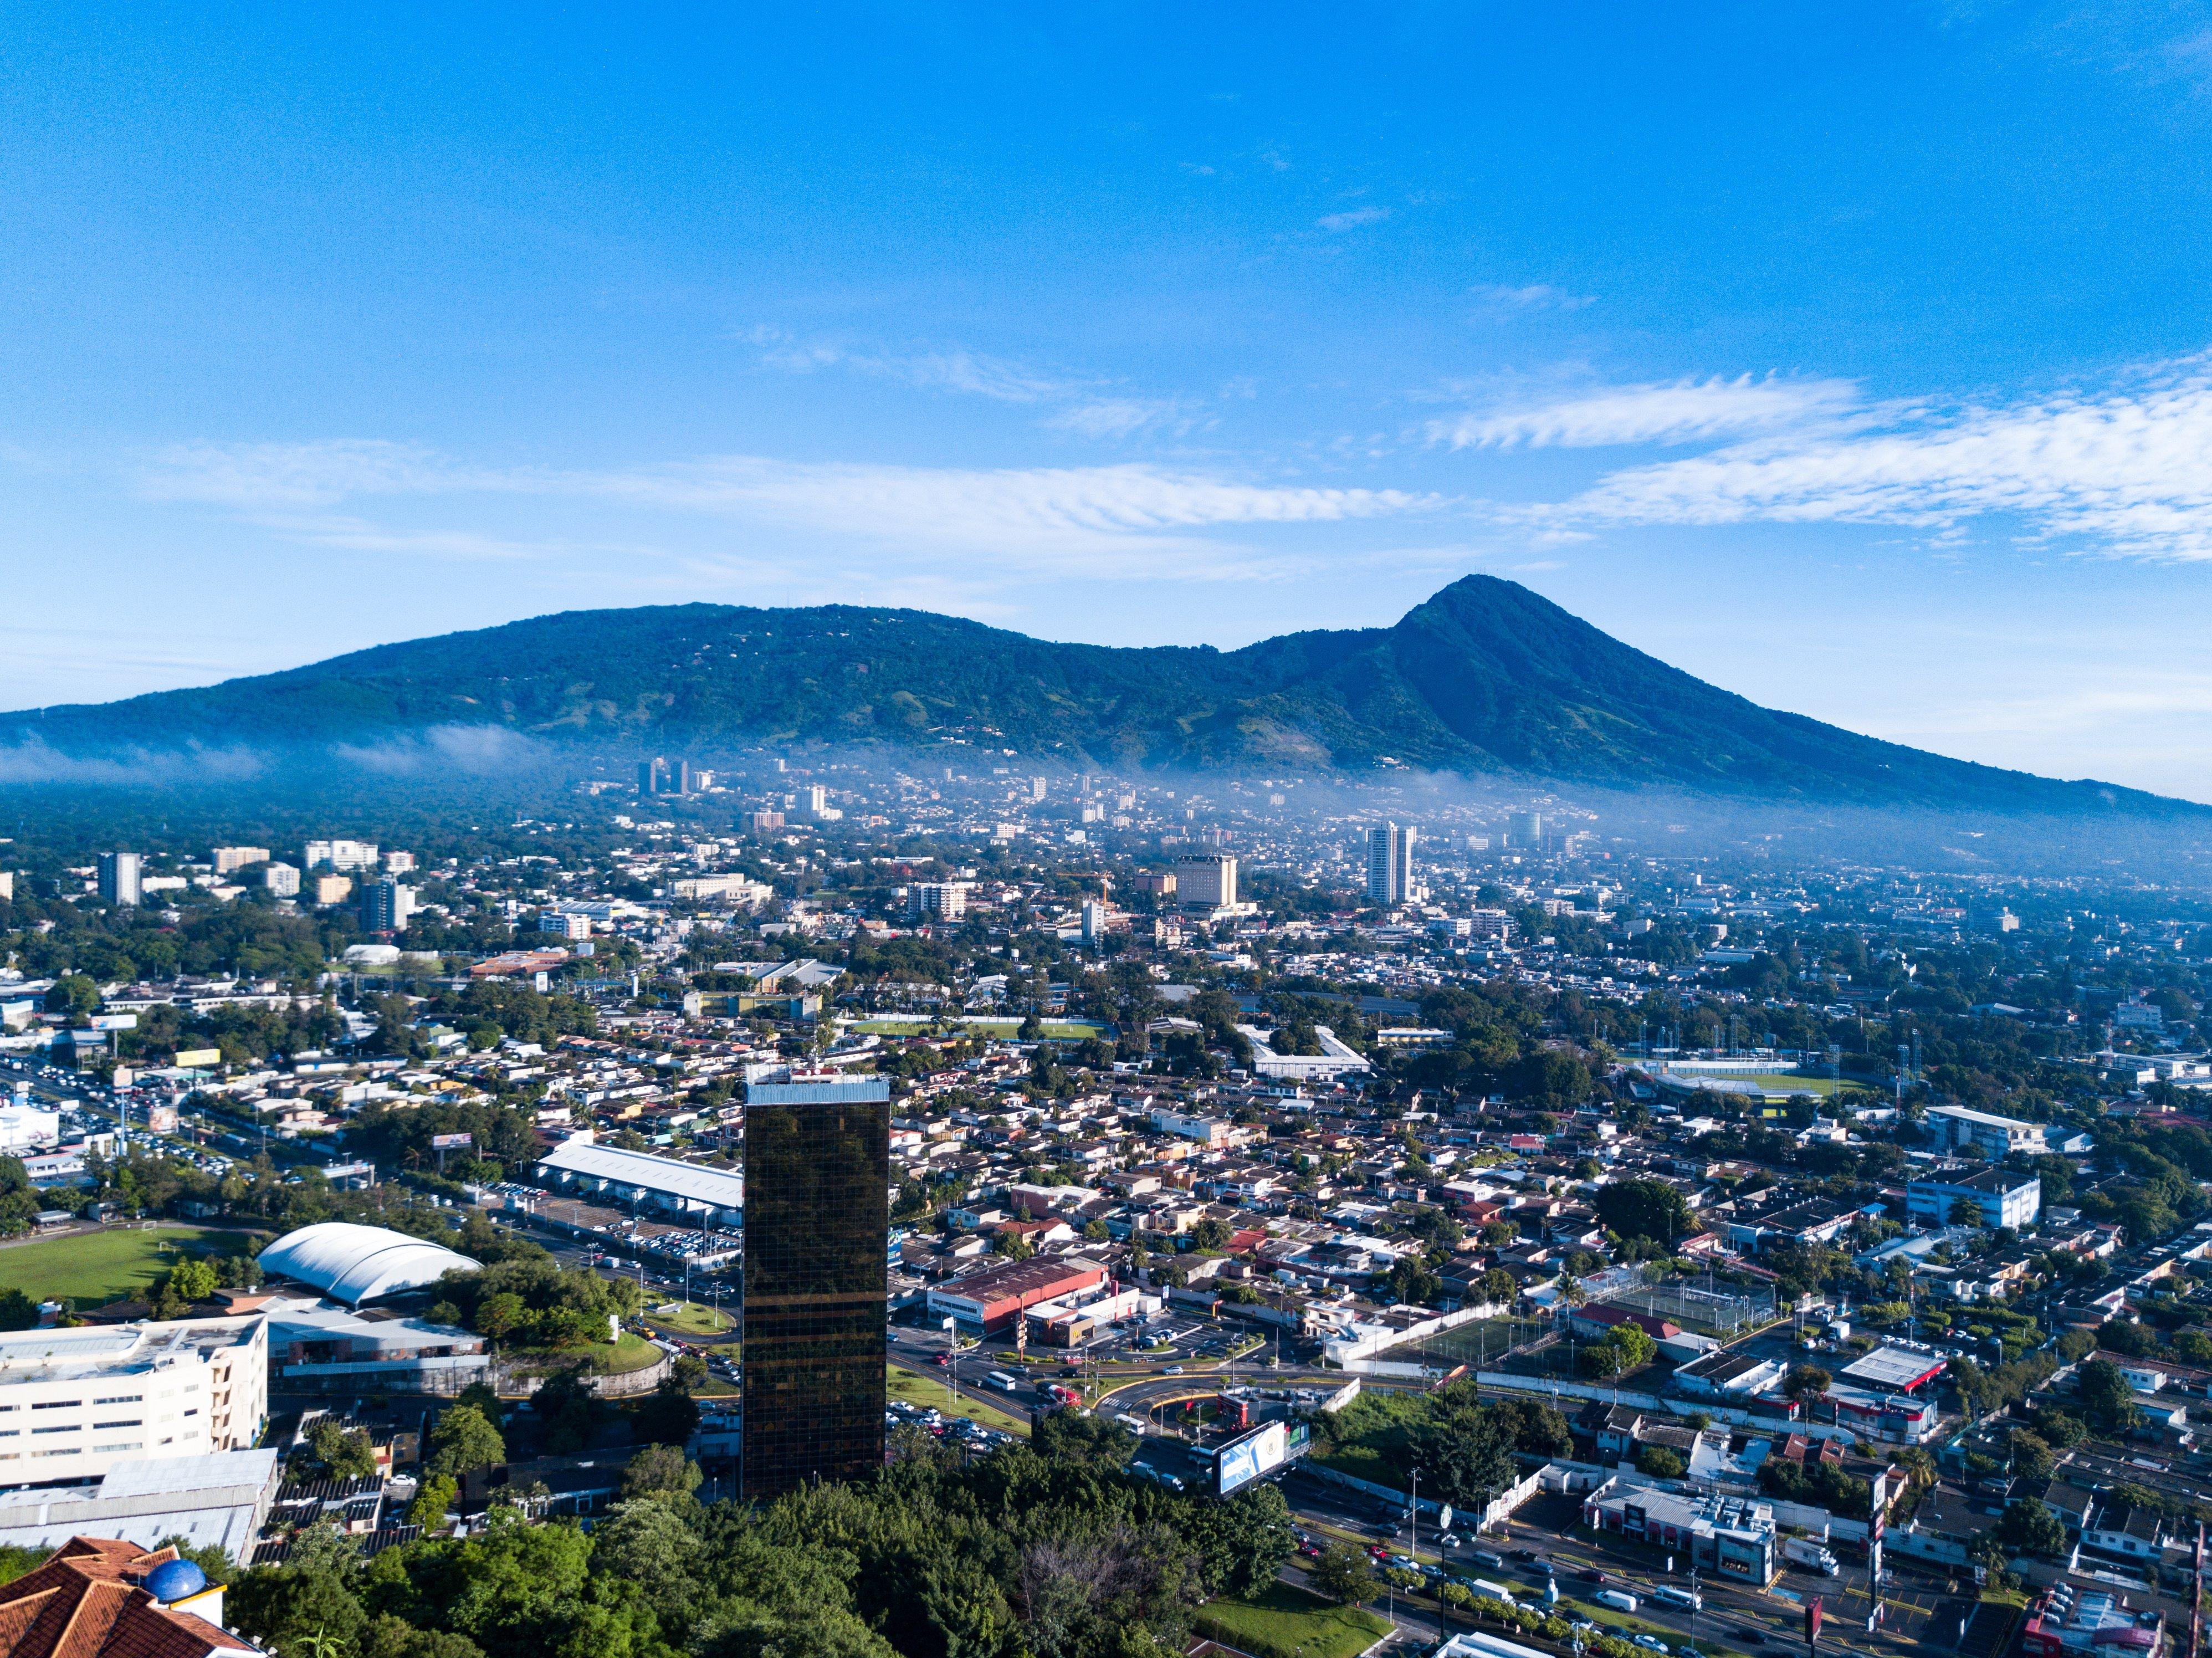 Bitcoin's Market Cap Approaching $1 Trillion as El Salvador Buys 400 BTC